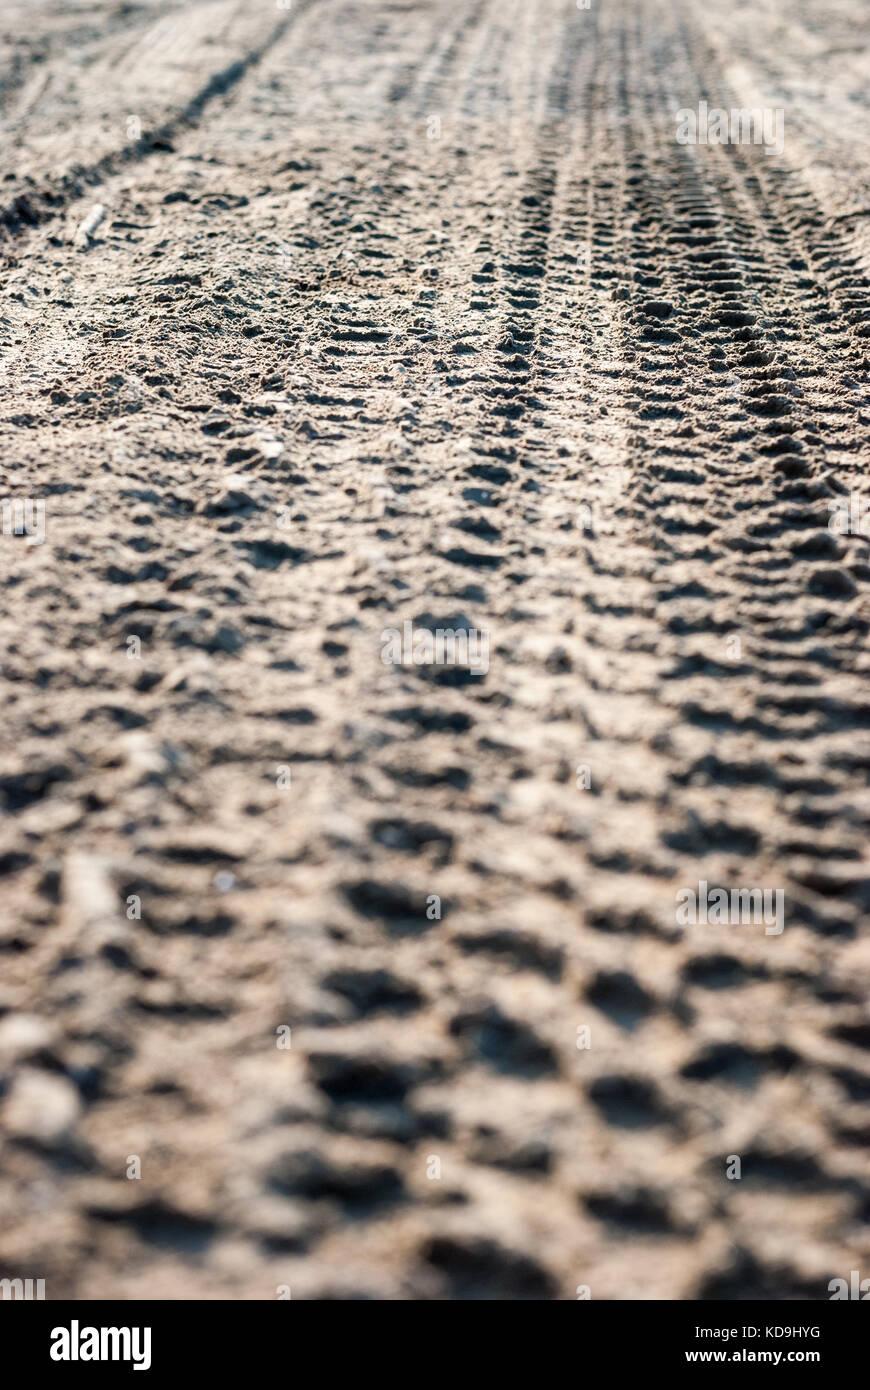 Truck tyre tracks on sandy salt lake - Stock Image